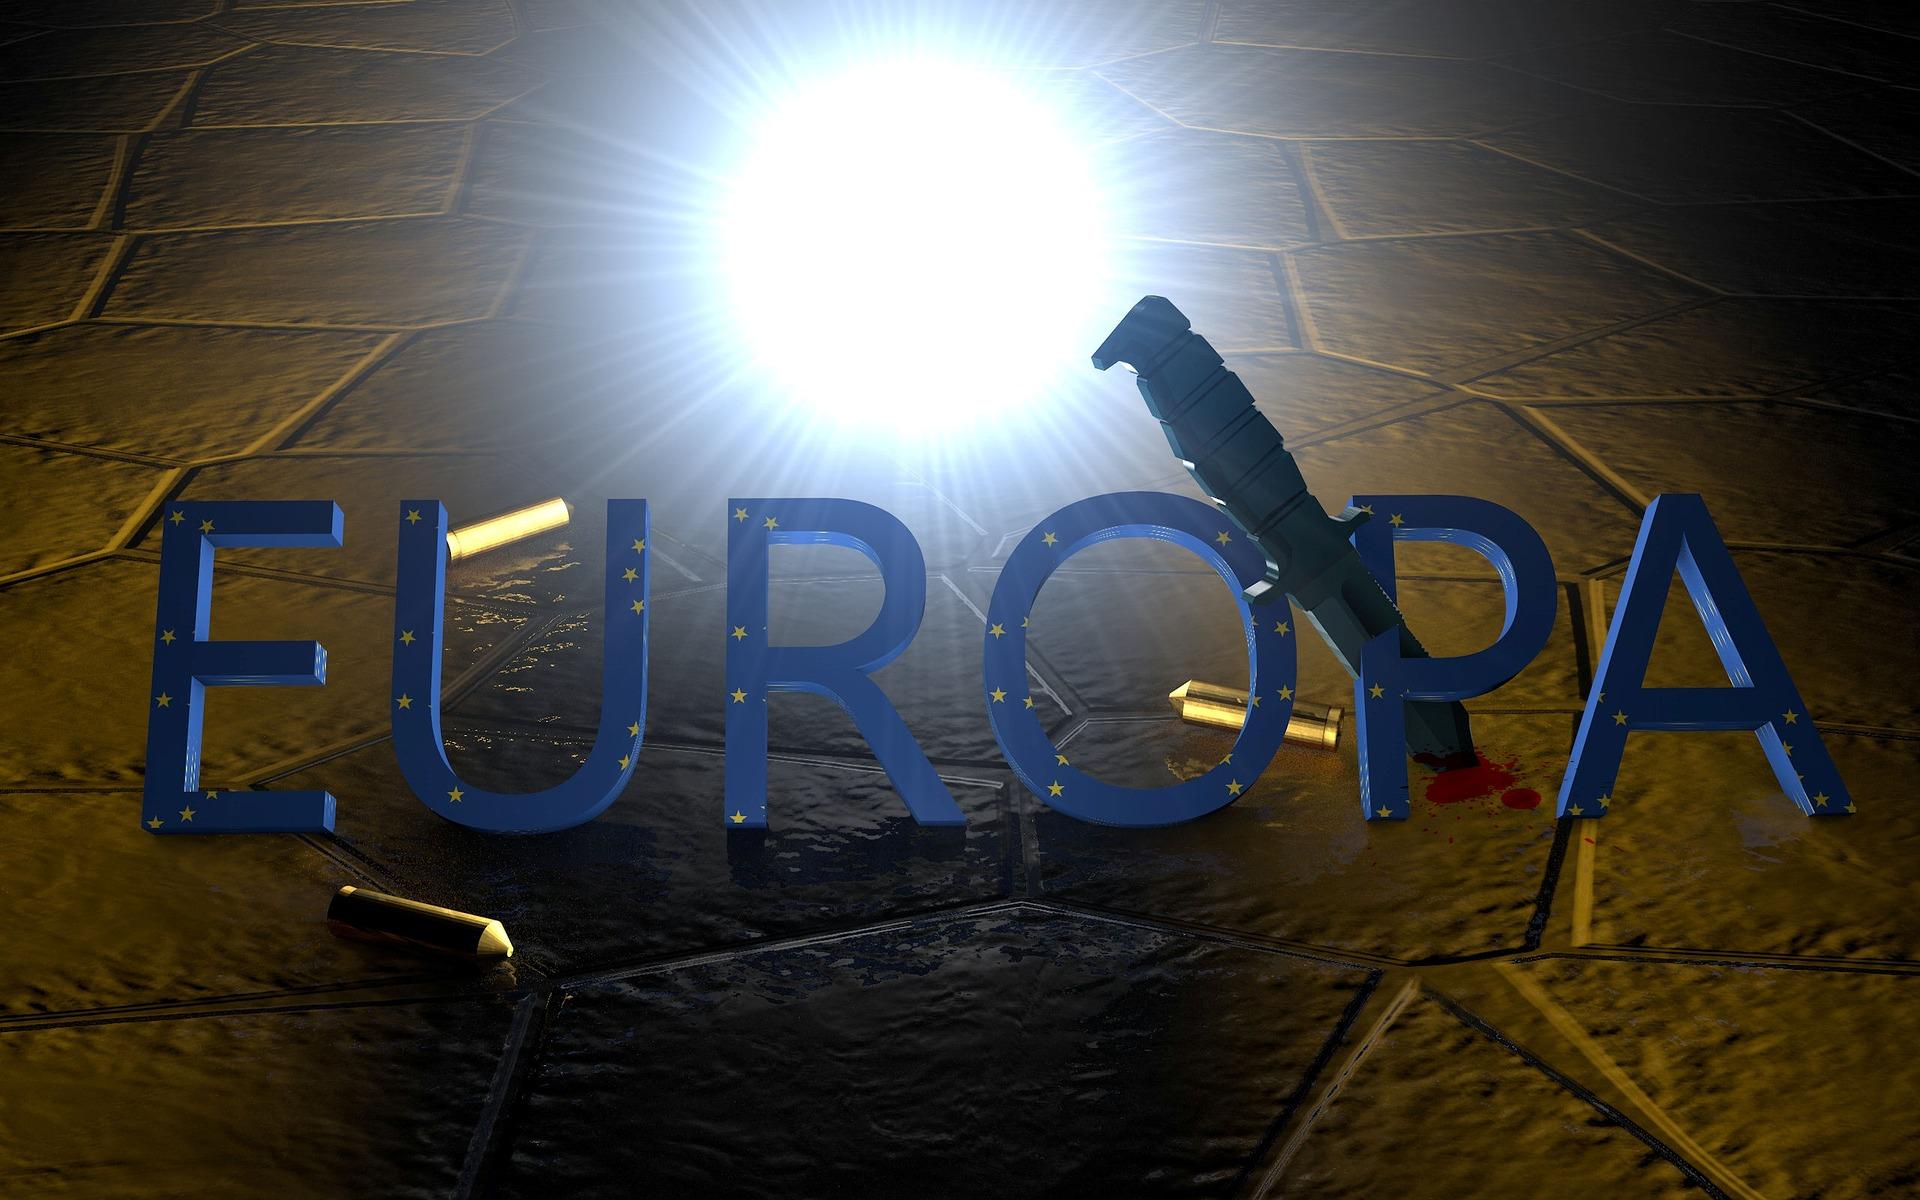 europe-2690714_1920